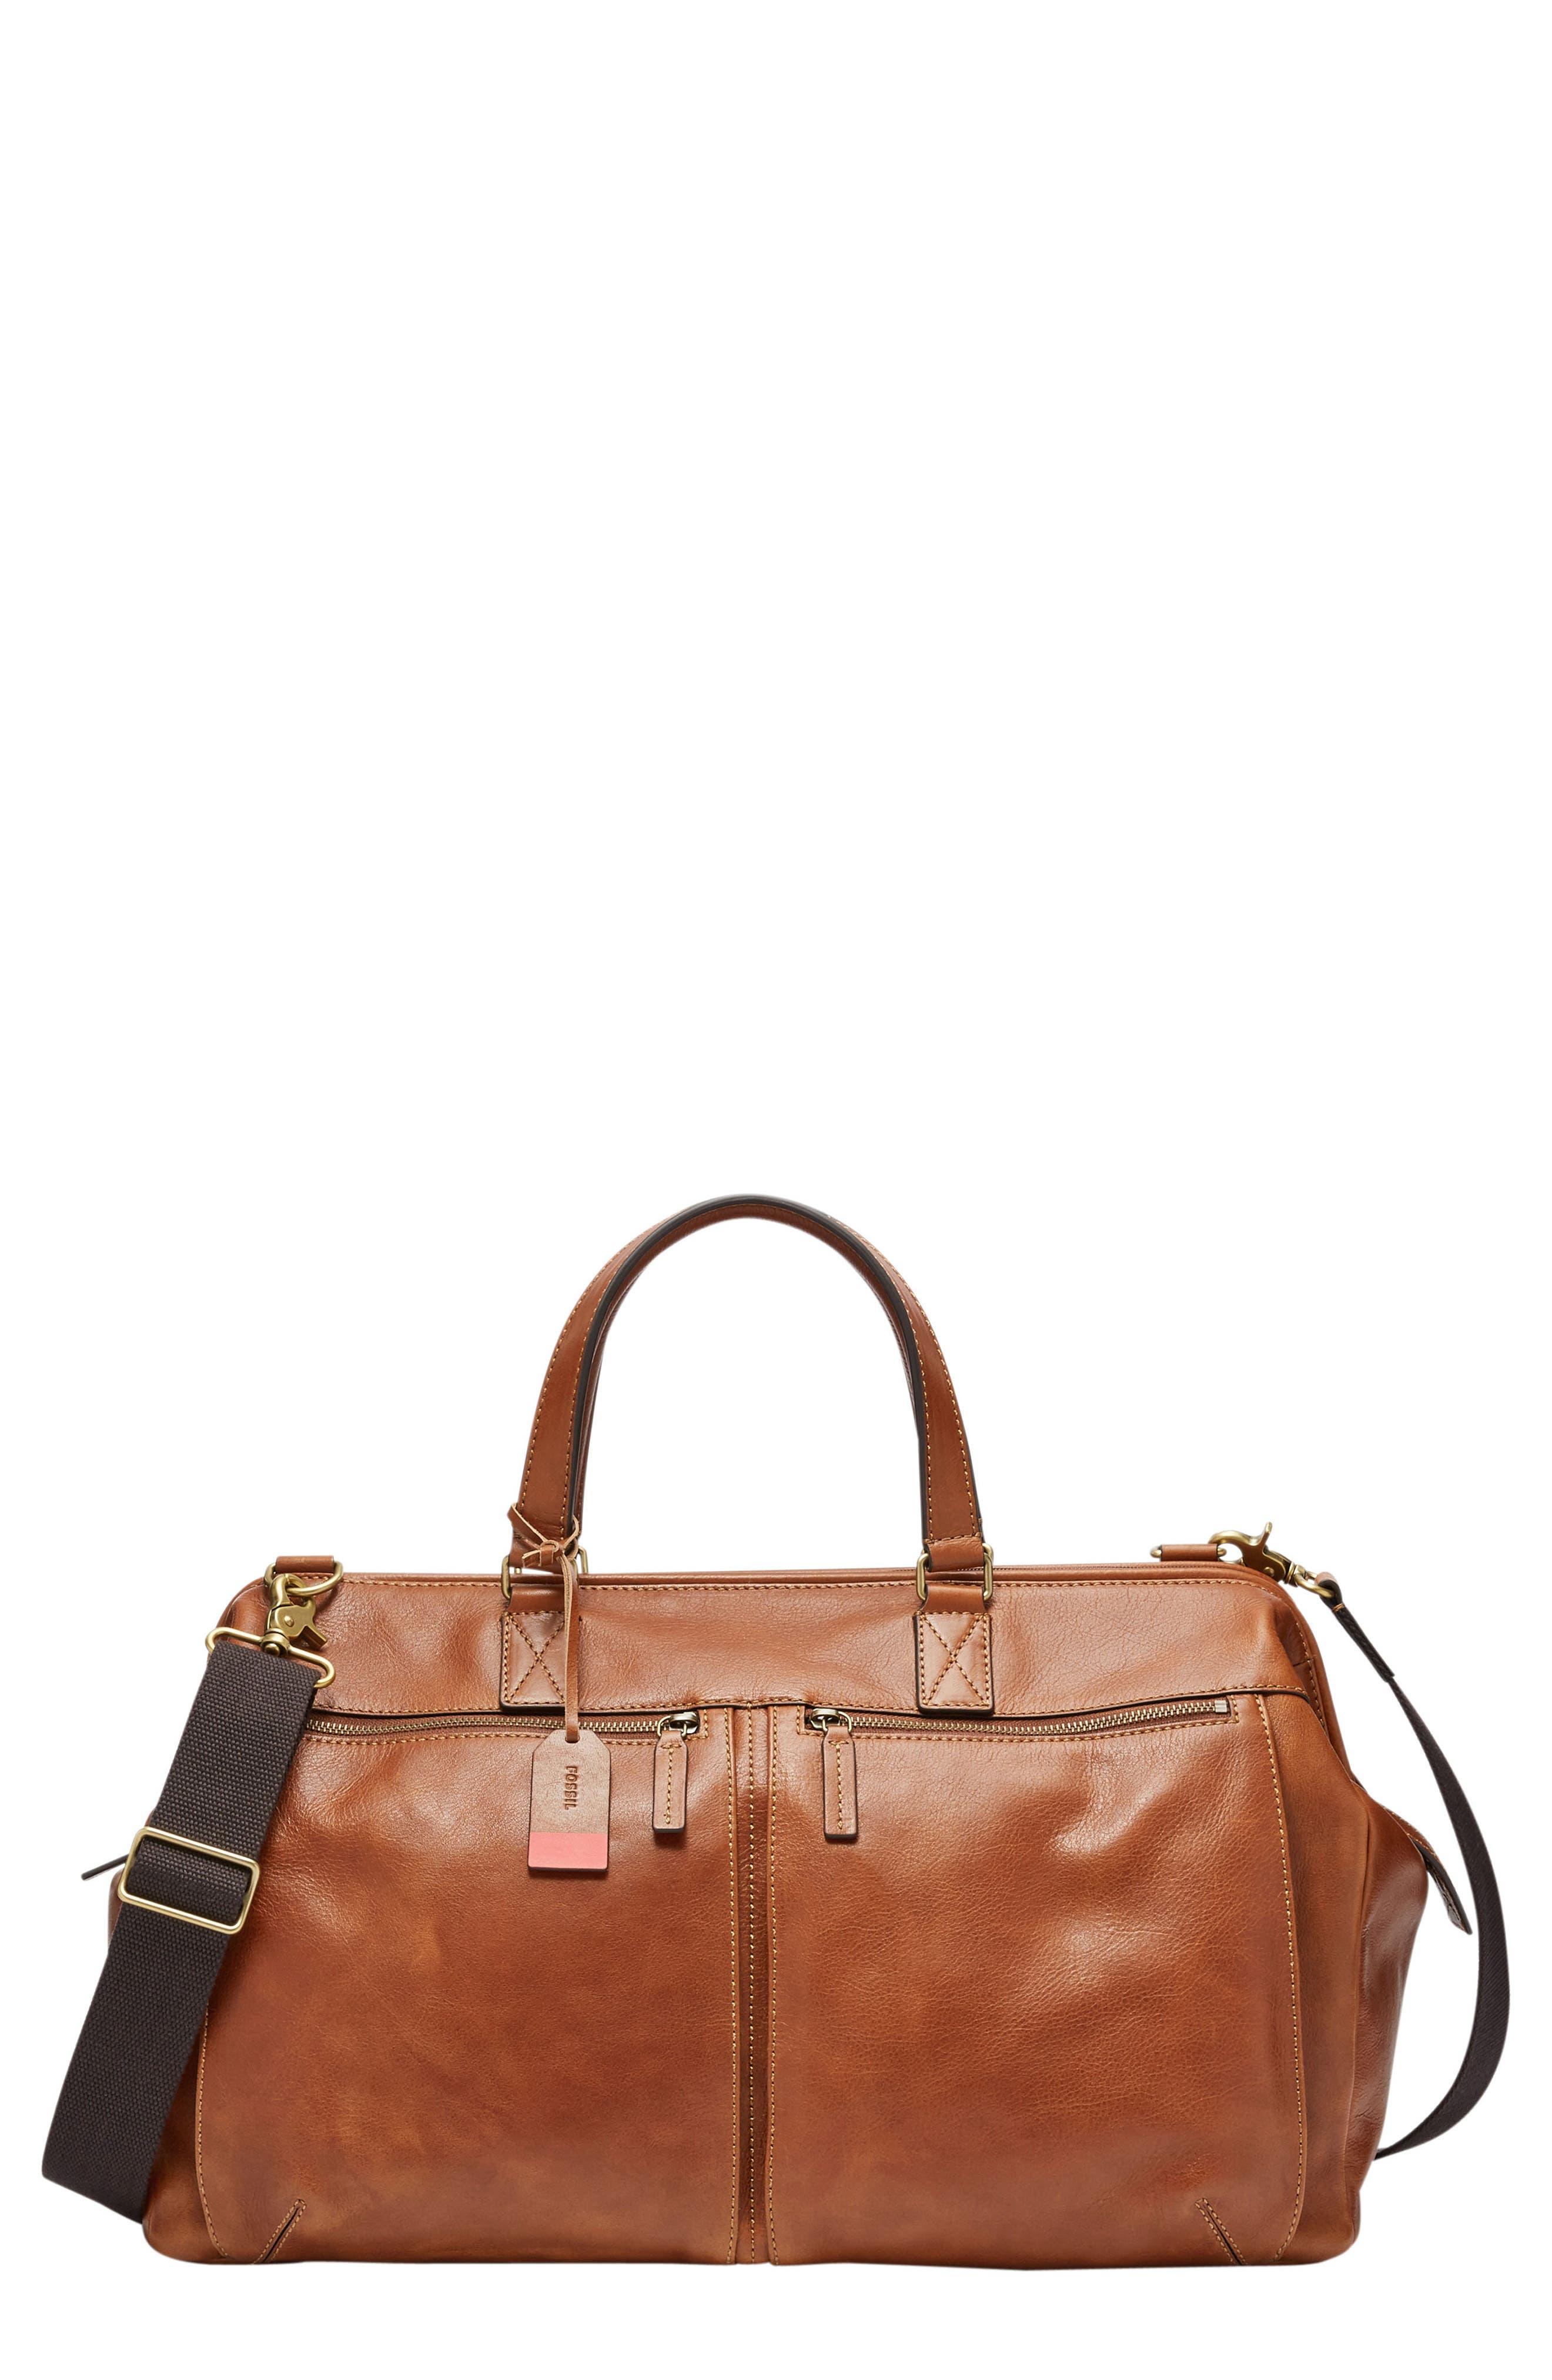 Defender Leather Duffle Bag